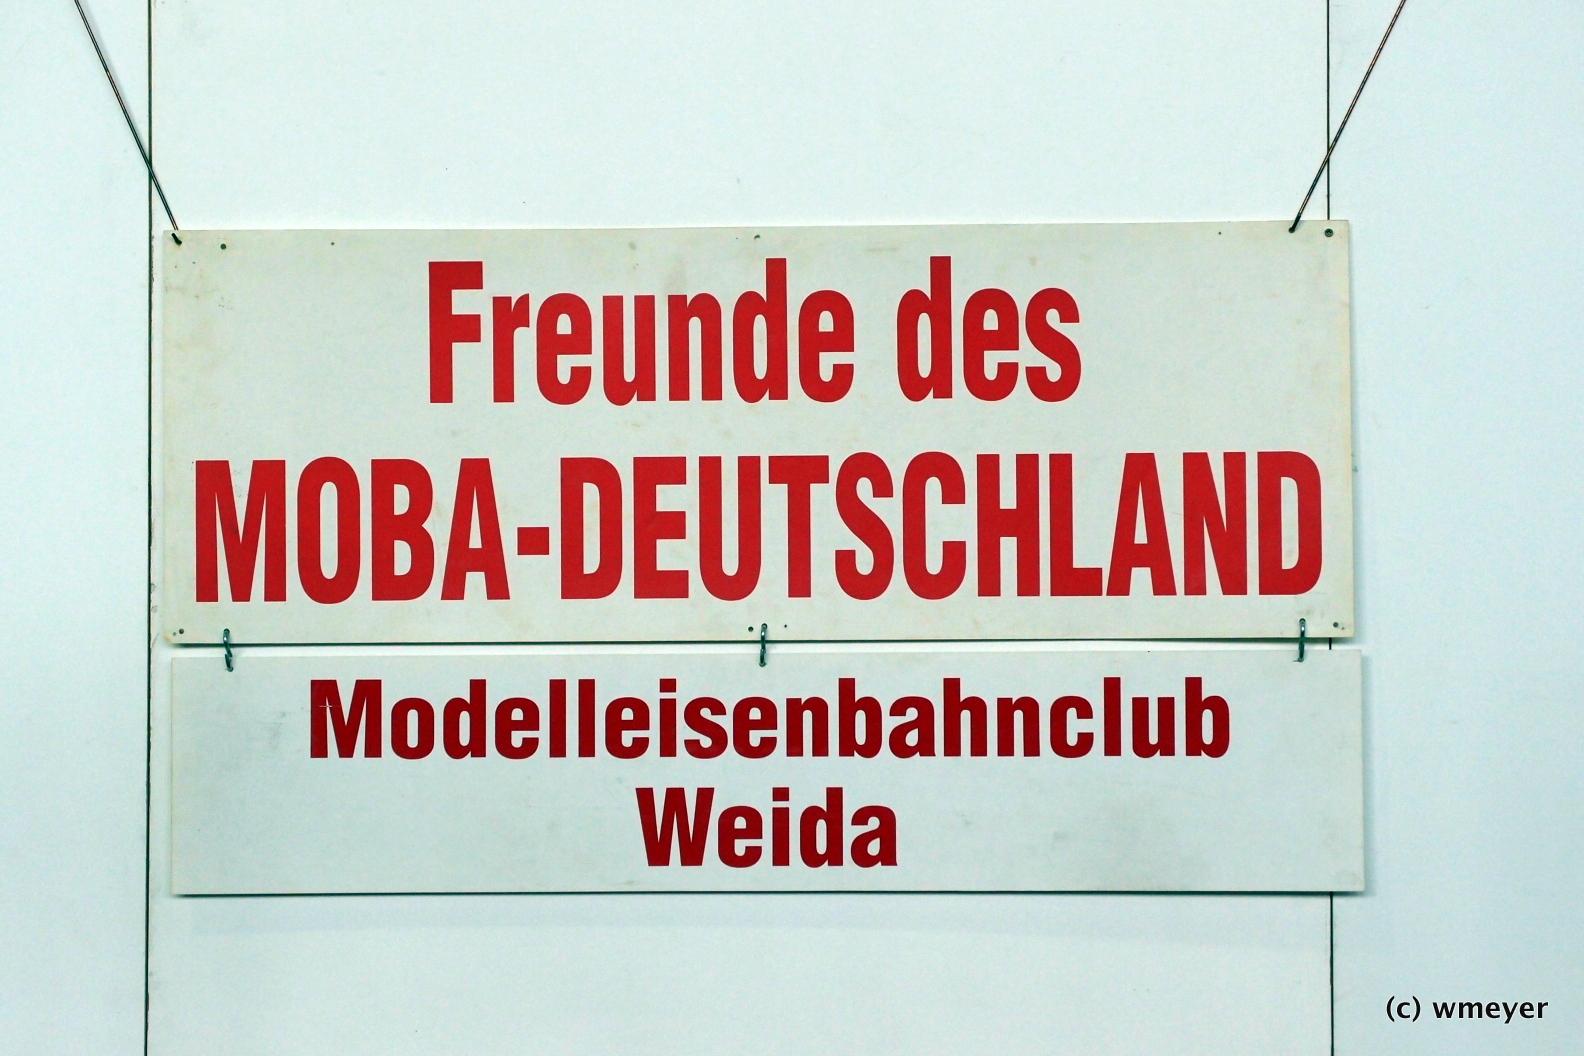 MEC Weida mit DR-Motiven